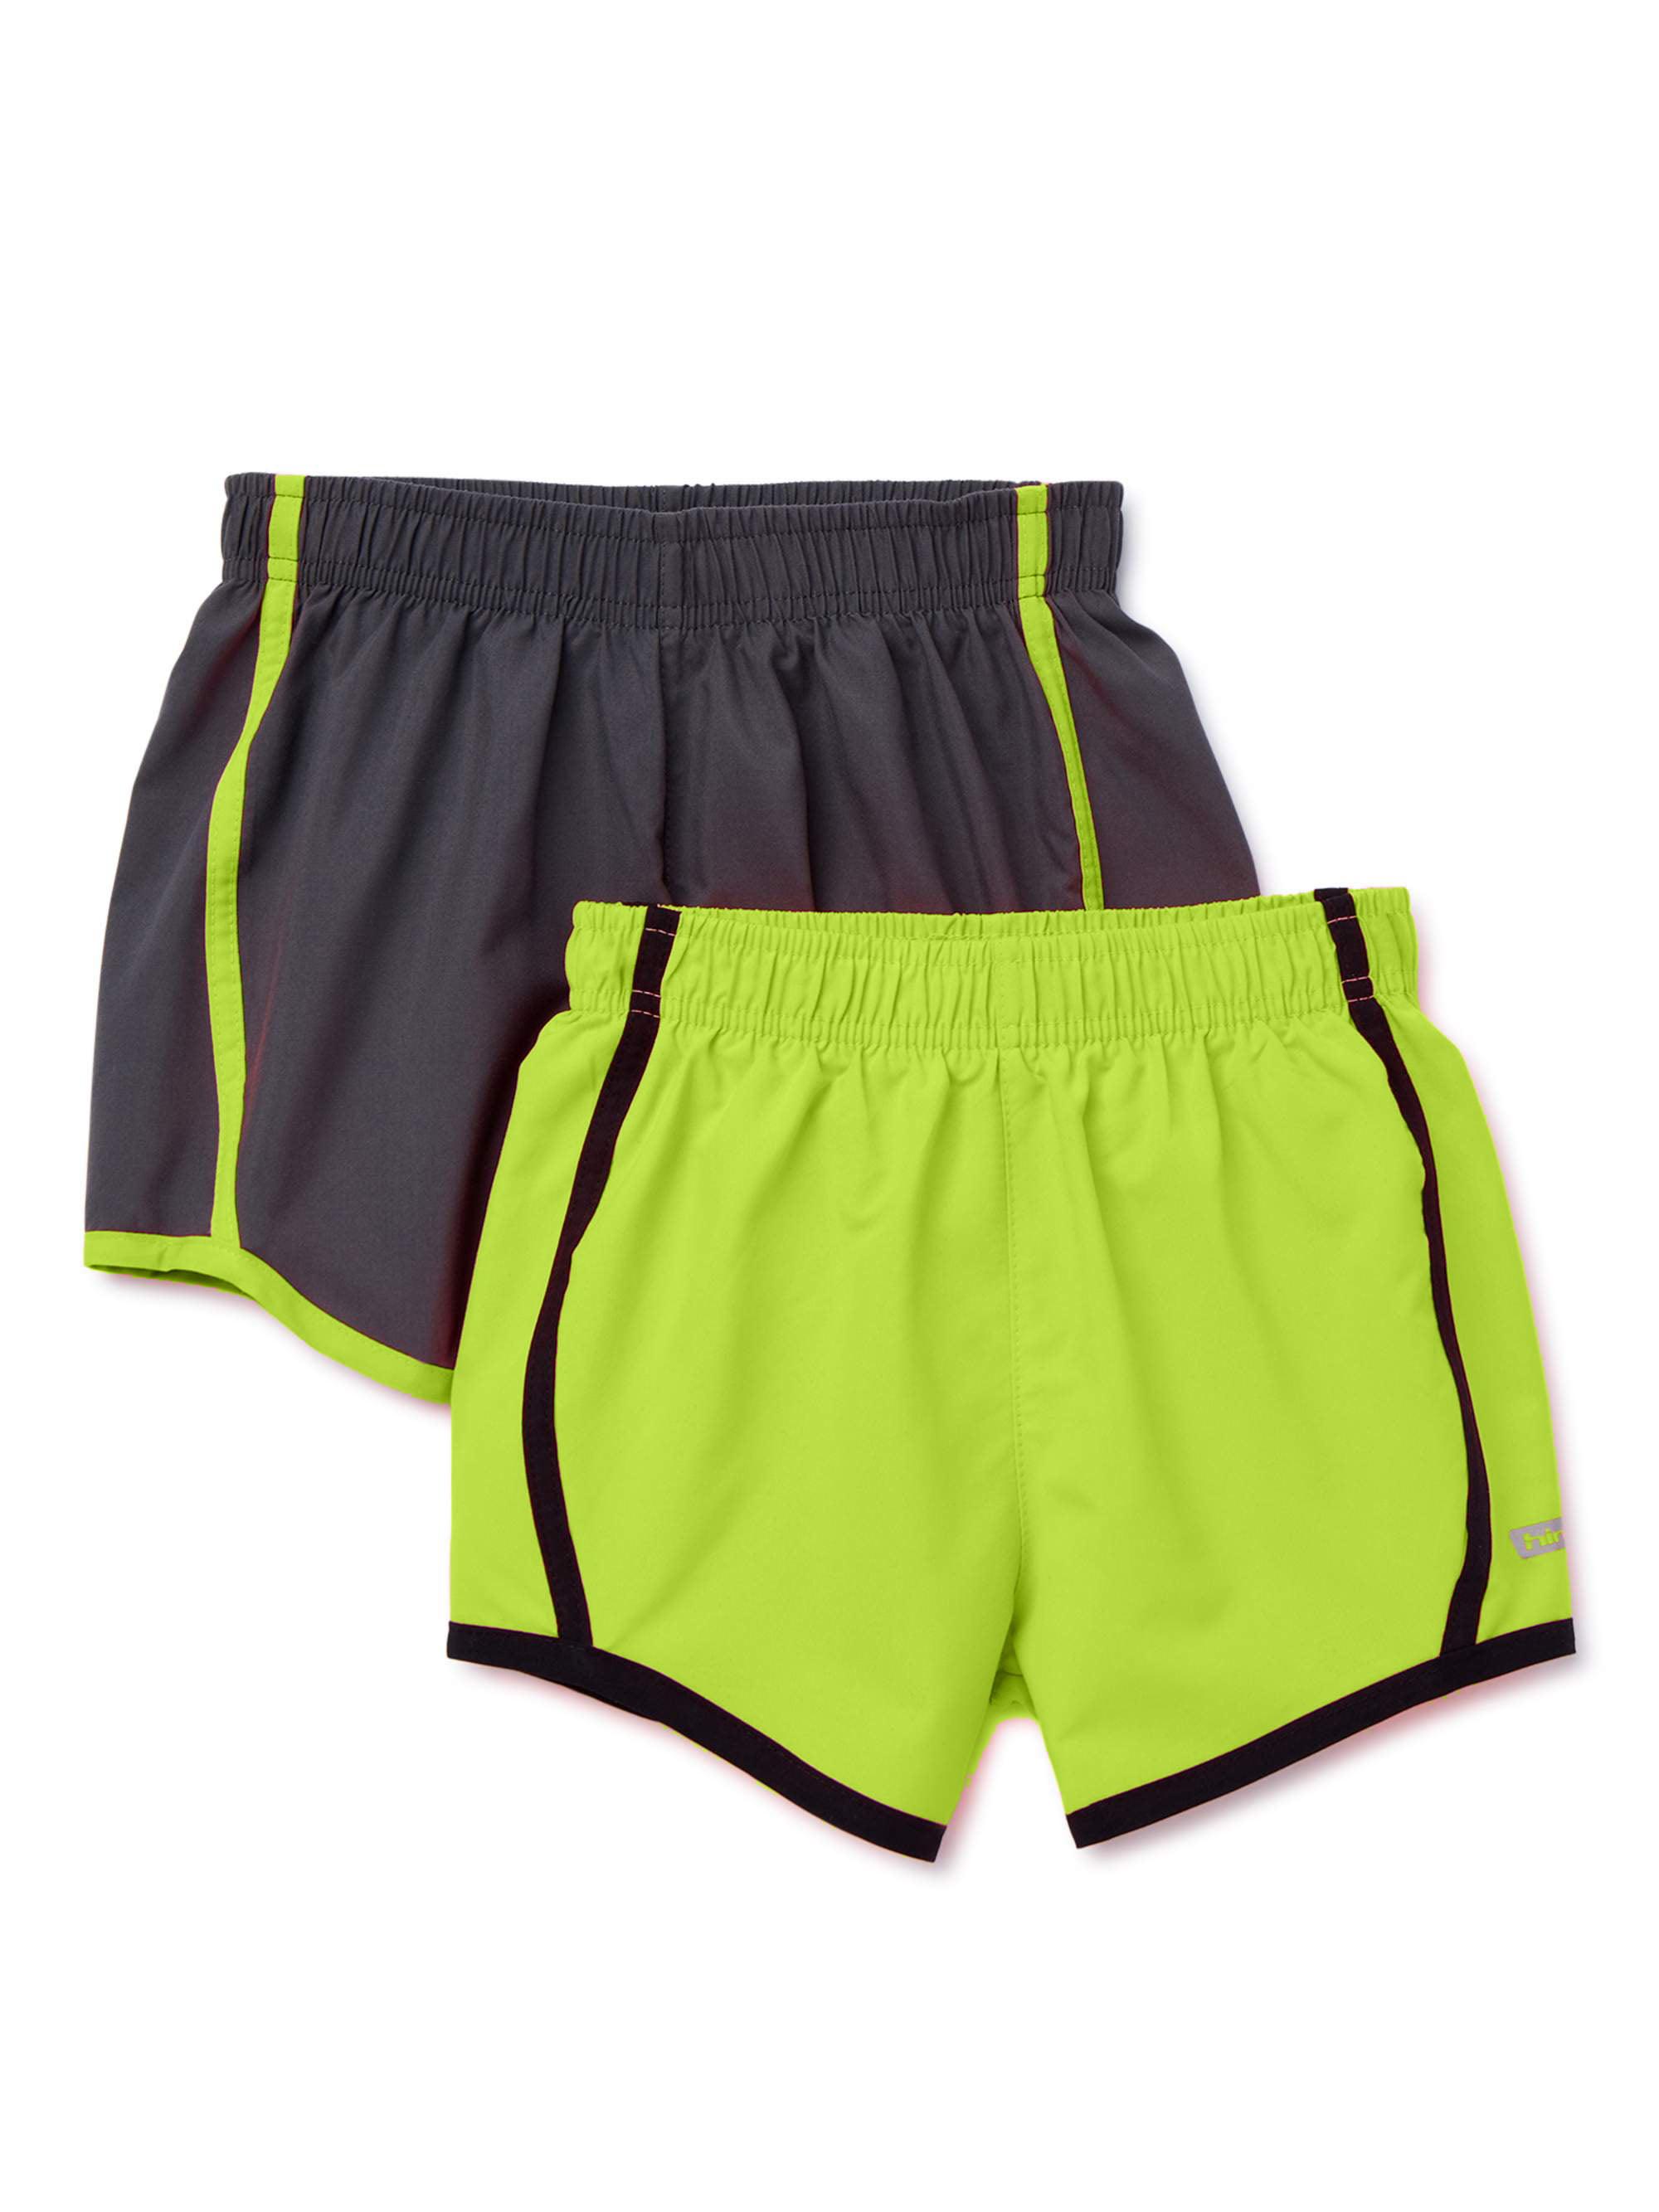 Star Ride Hind Boys Basketball Shorts 2-Pack